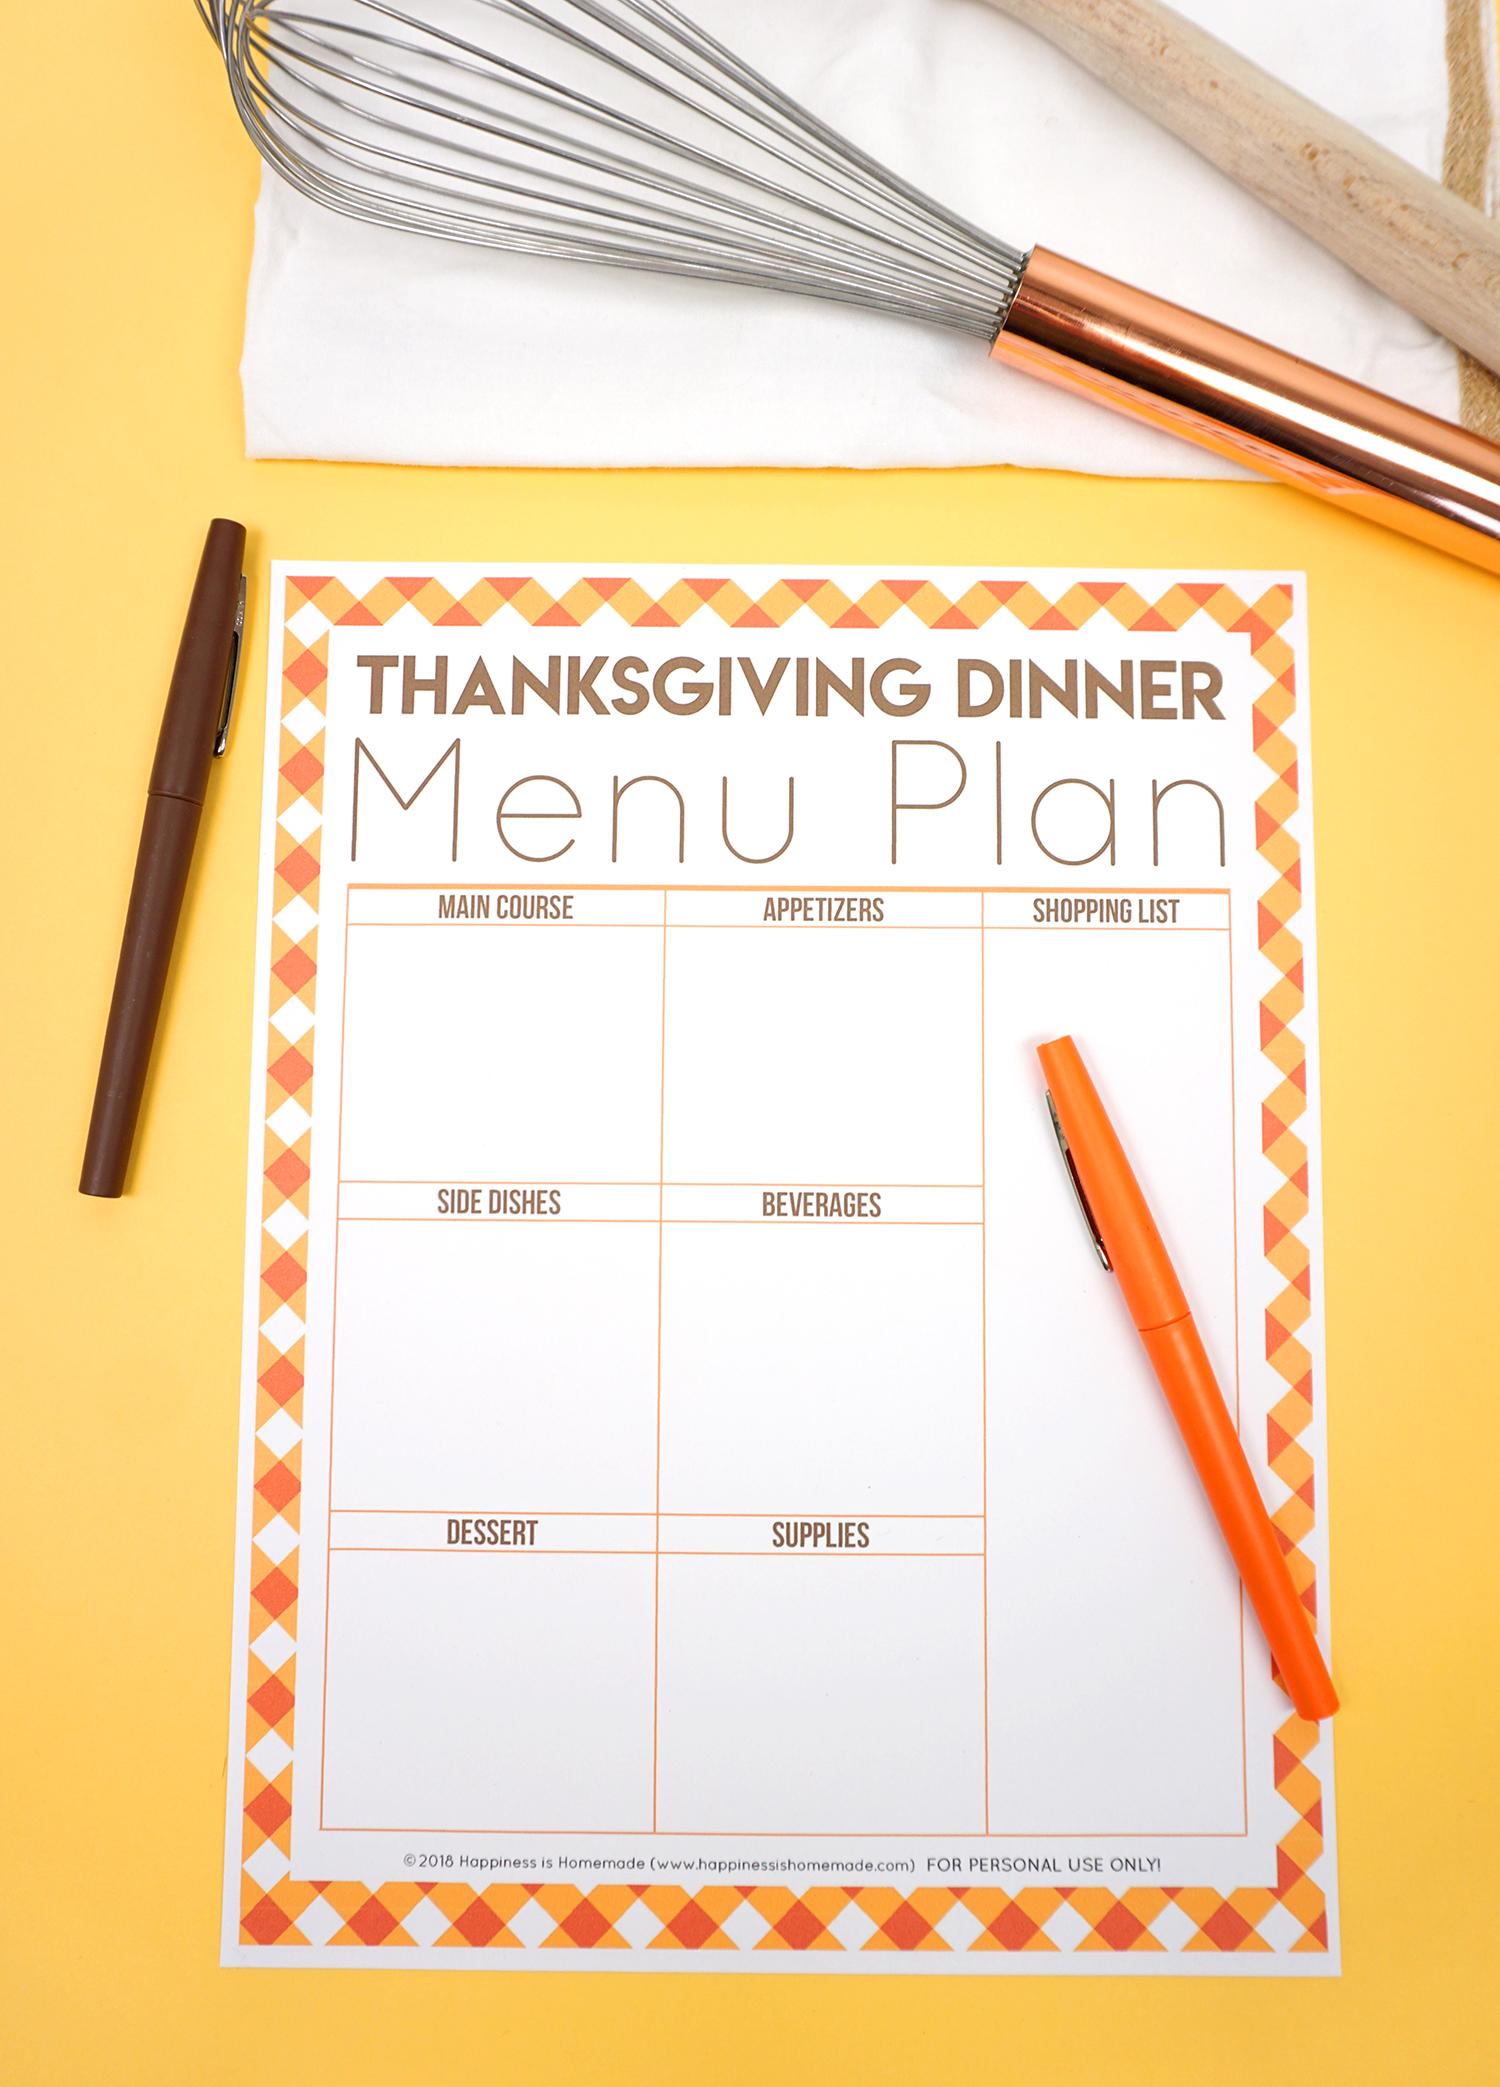 photo regarding Thanksgiving Menu Planner Printable titled Free of charge Thanksgiving Printables - Menu Planner, Visitor Record